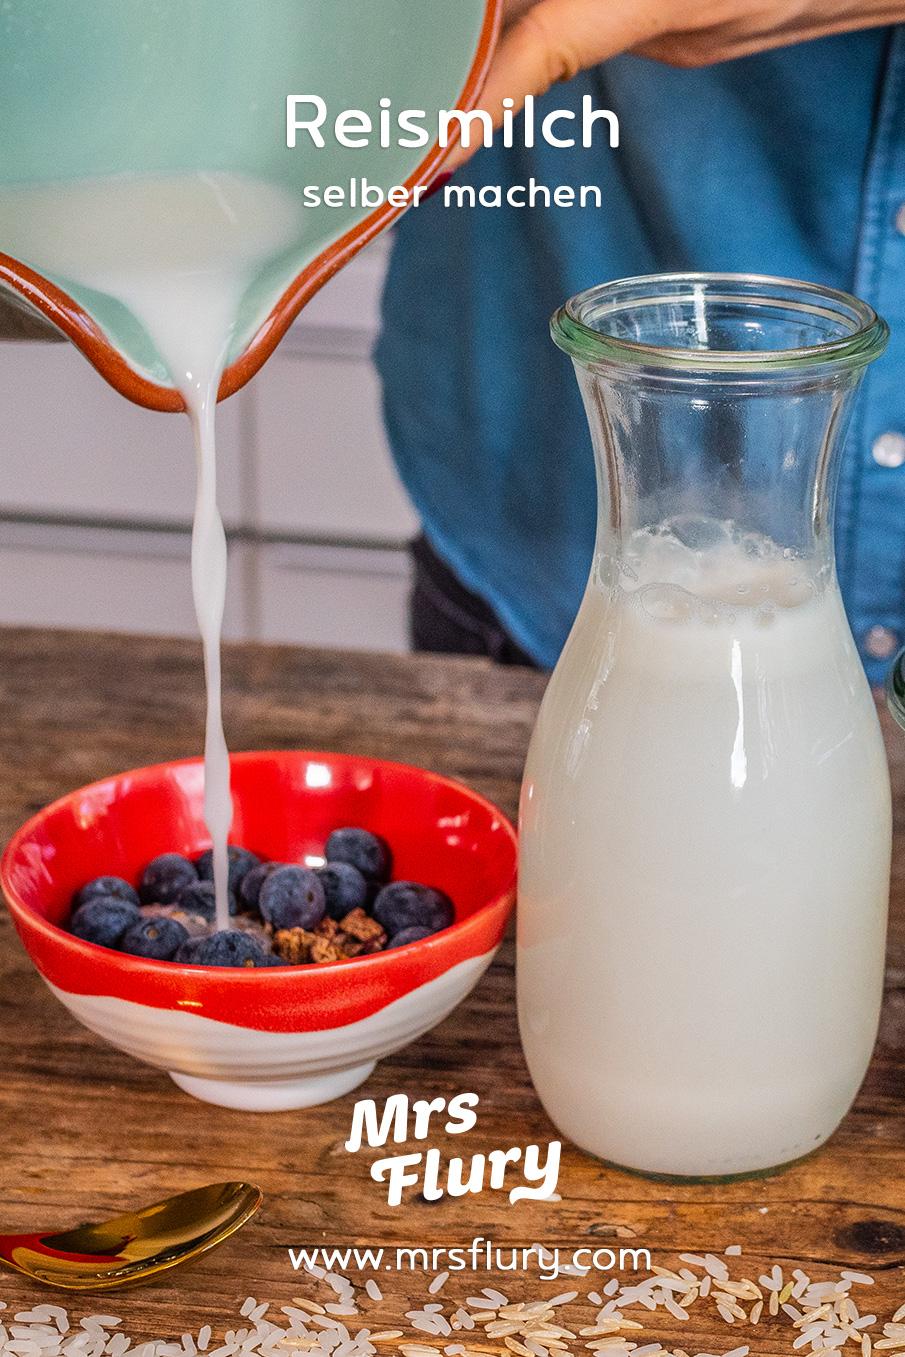 Reismilch Mrs Flury